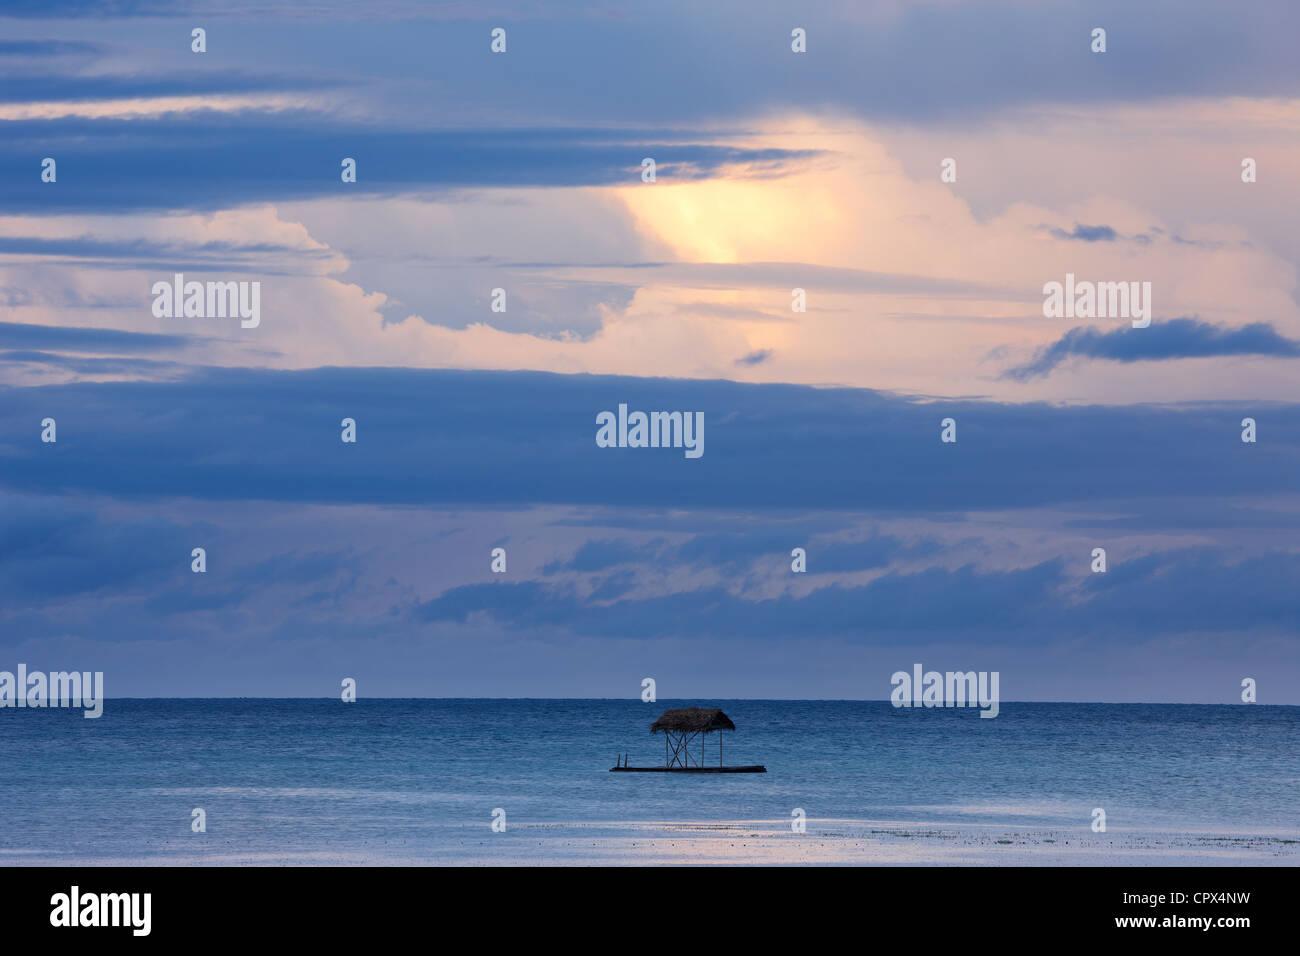 a diving platform off San Juan Beach at dusk, Siquijor, The Visayas, Philippines - Stock Image